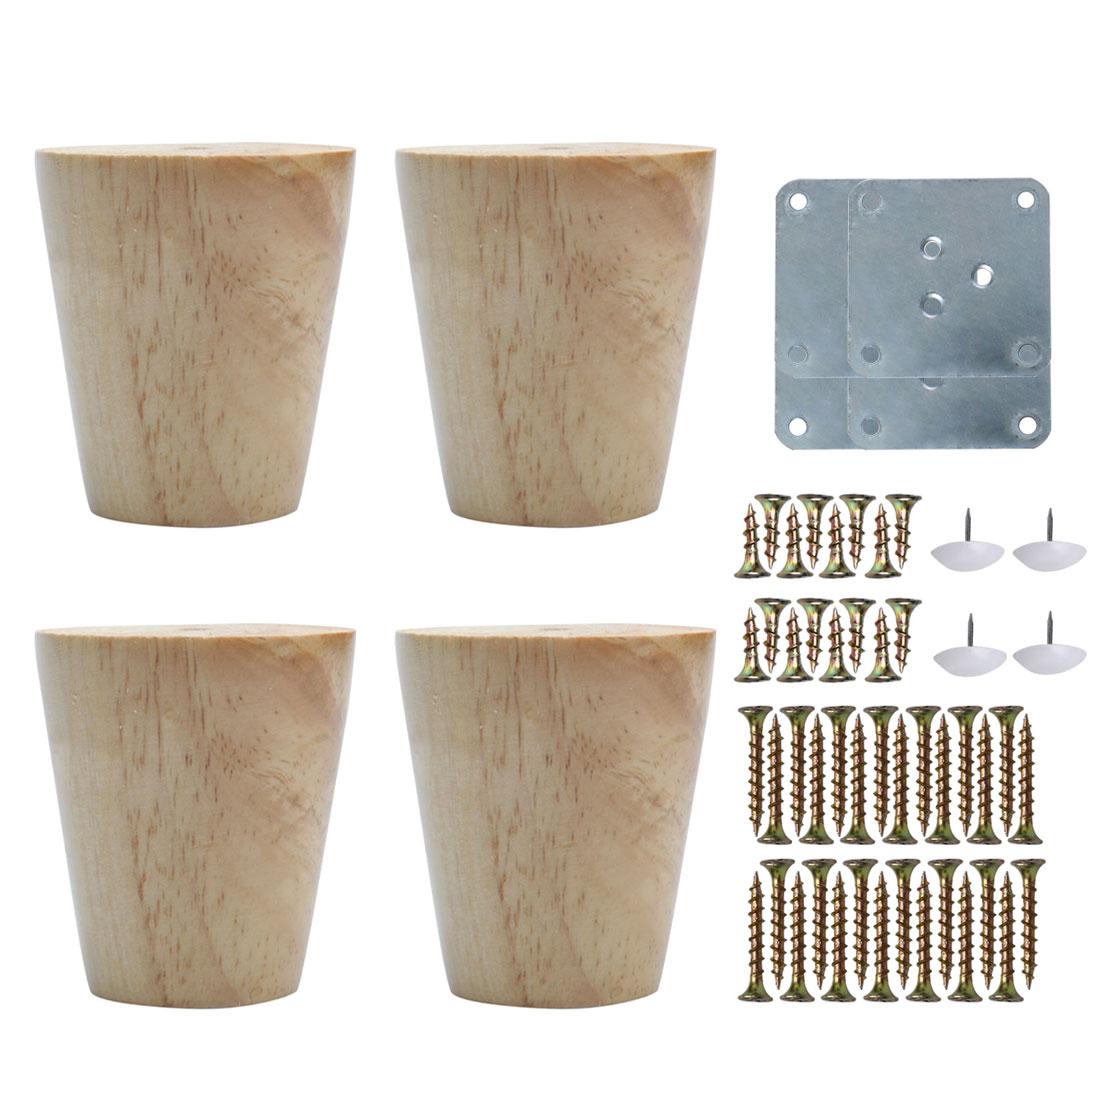 "3"" Wood Furniture Leg Chair Desk Cabinet Feet Replacement Height Adjuster 4pcs"